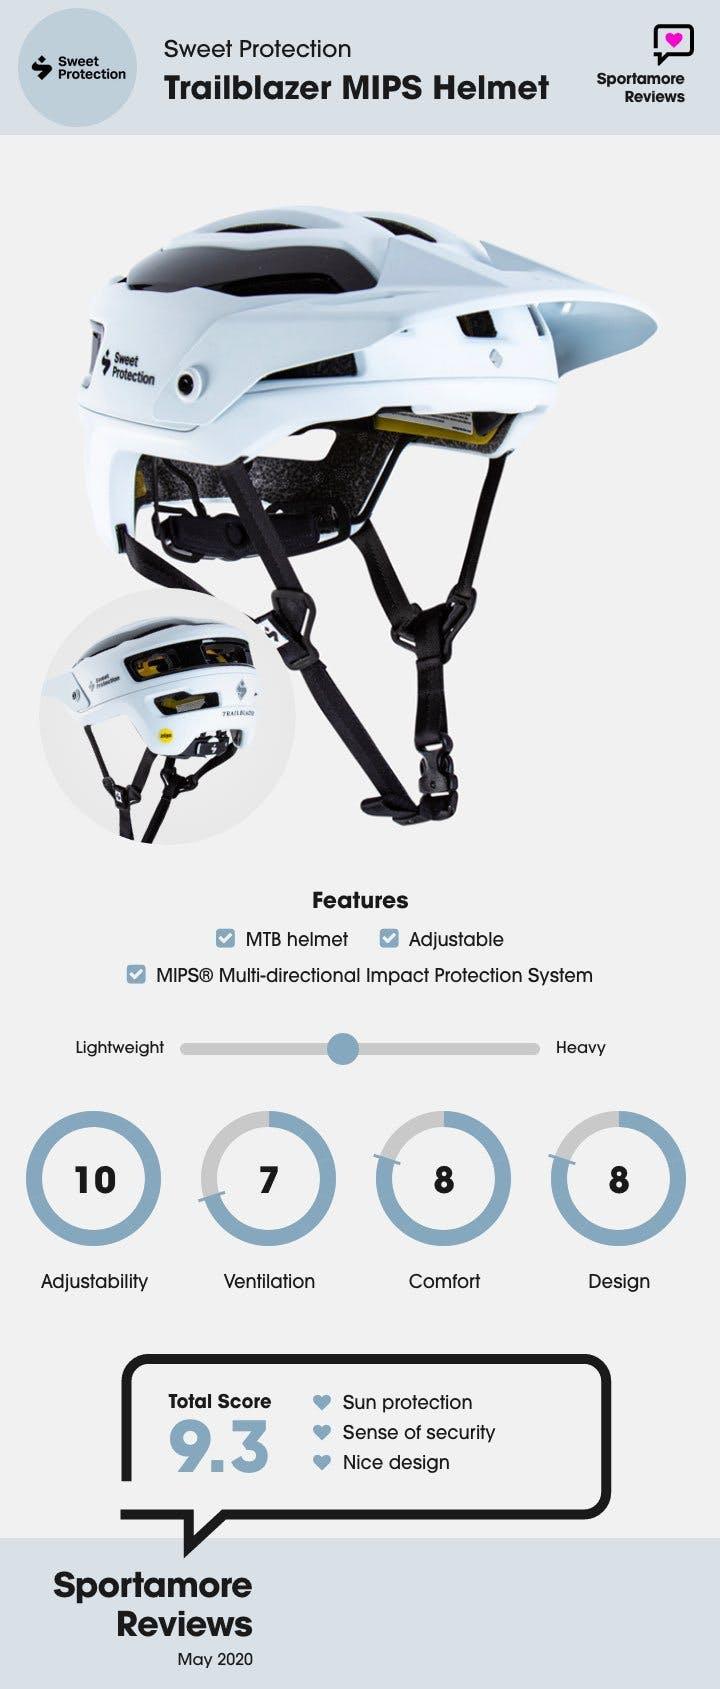 Sweet Protection Trailblazer MIPS Helmet.jpg